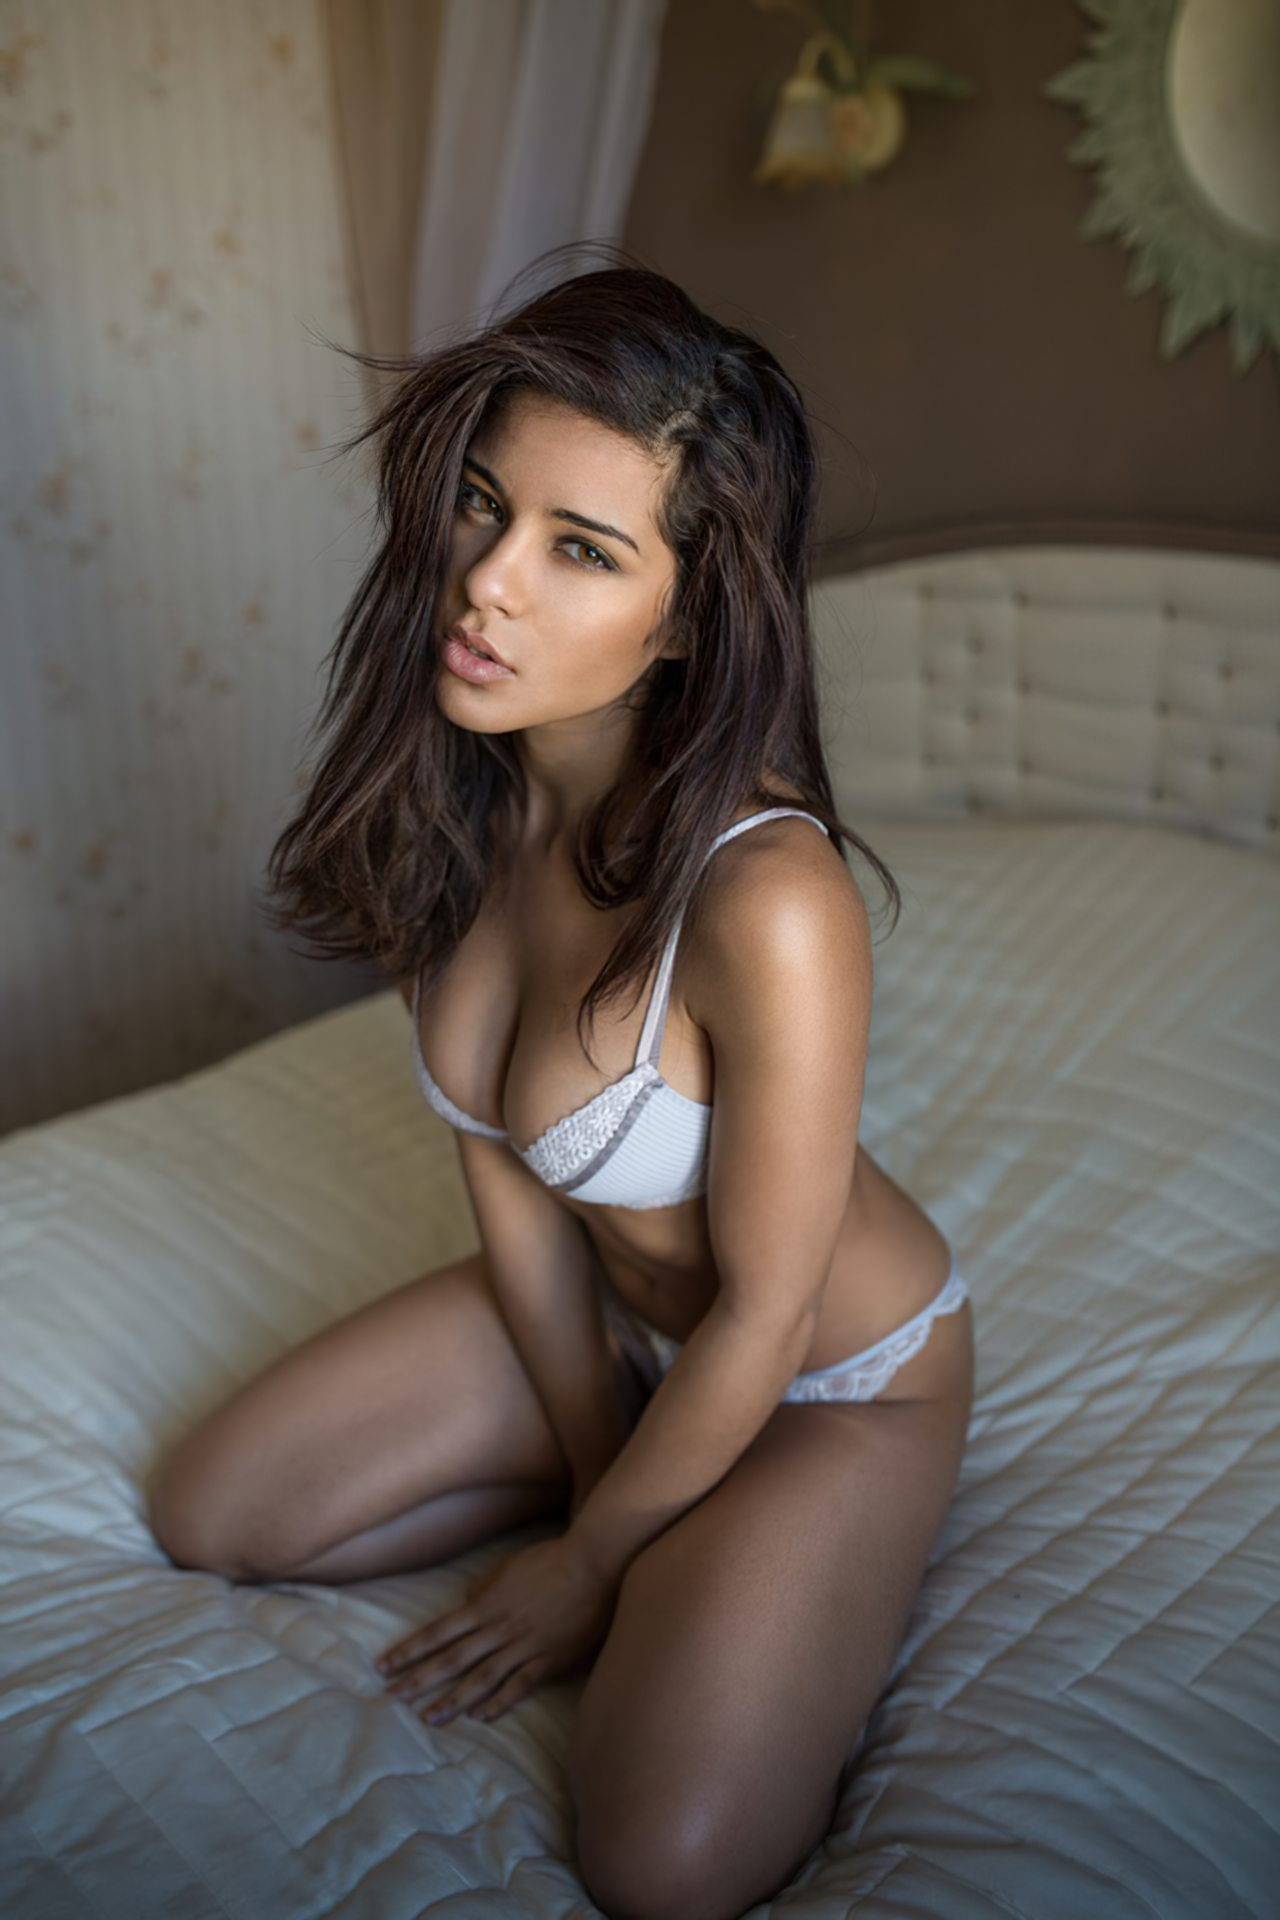 50 Fotos de Mulheres (19)